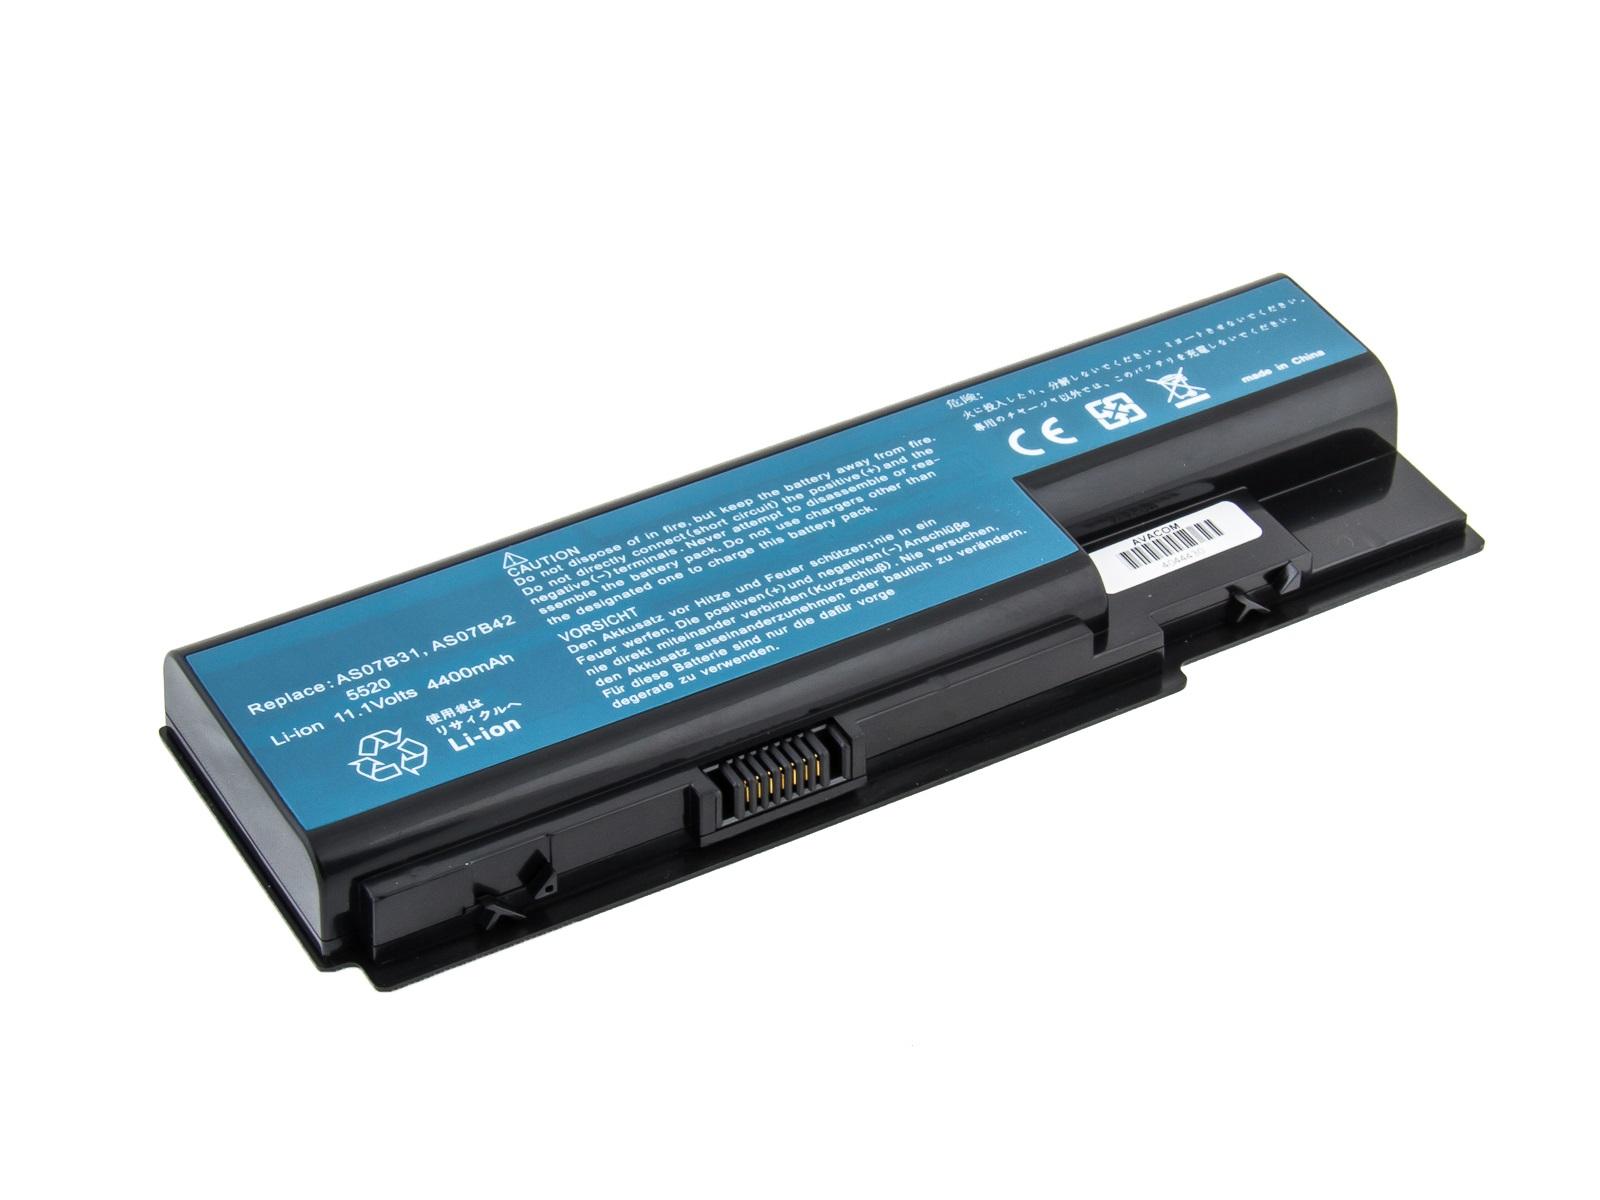 Baterie AVACOM NOAC-6920-N22 pro Acer Aspire 5520/6920 Li-Ion 10,8V 4400mAh; NOAC-6920-N22